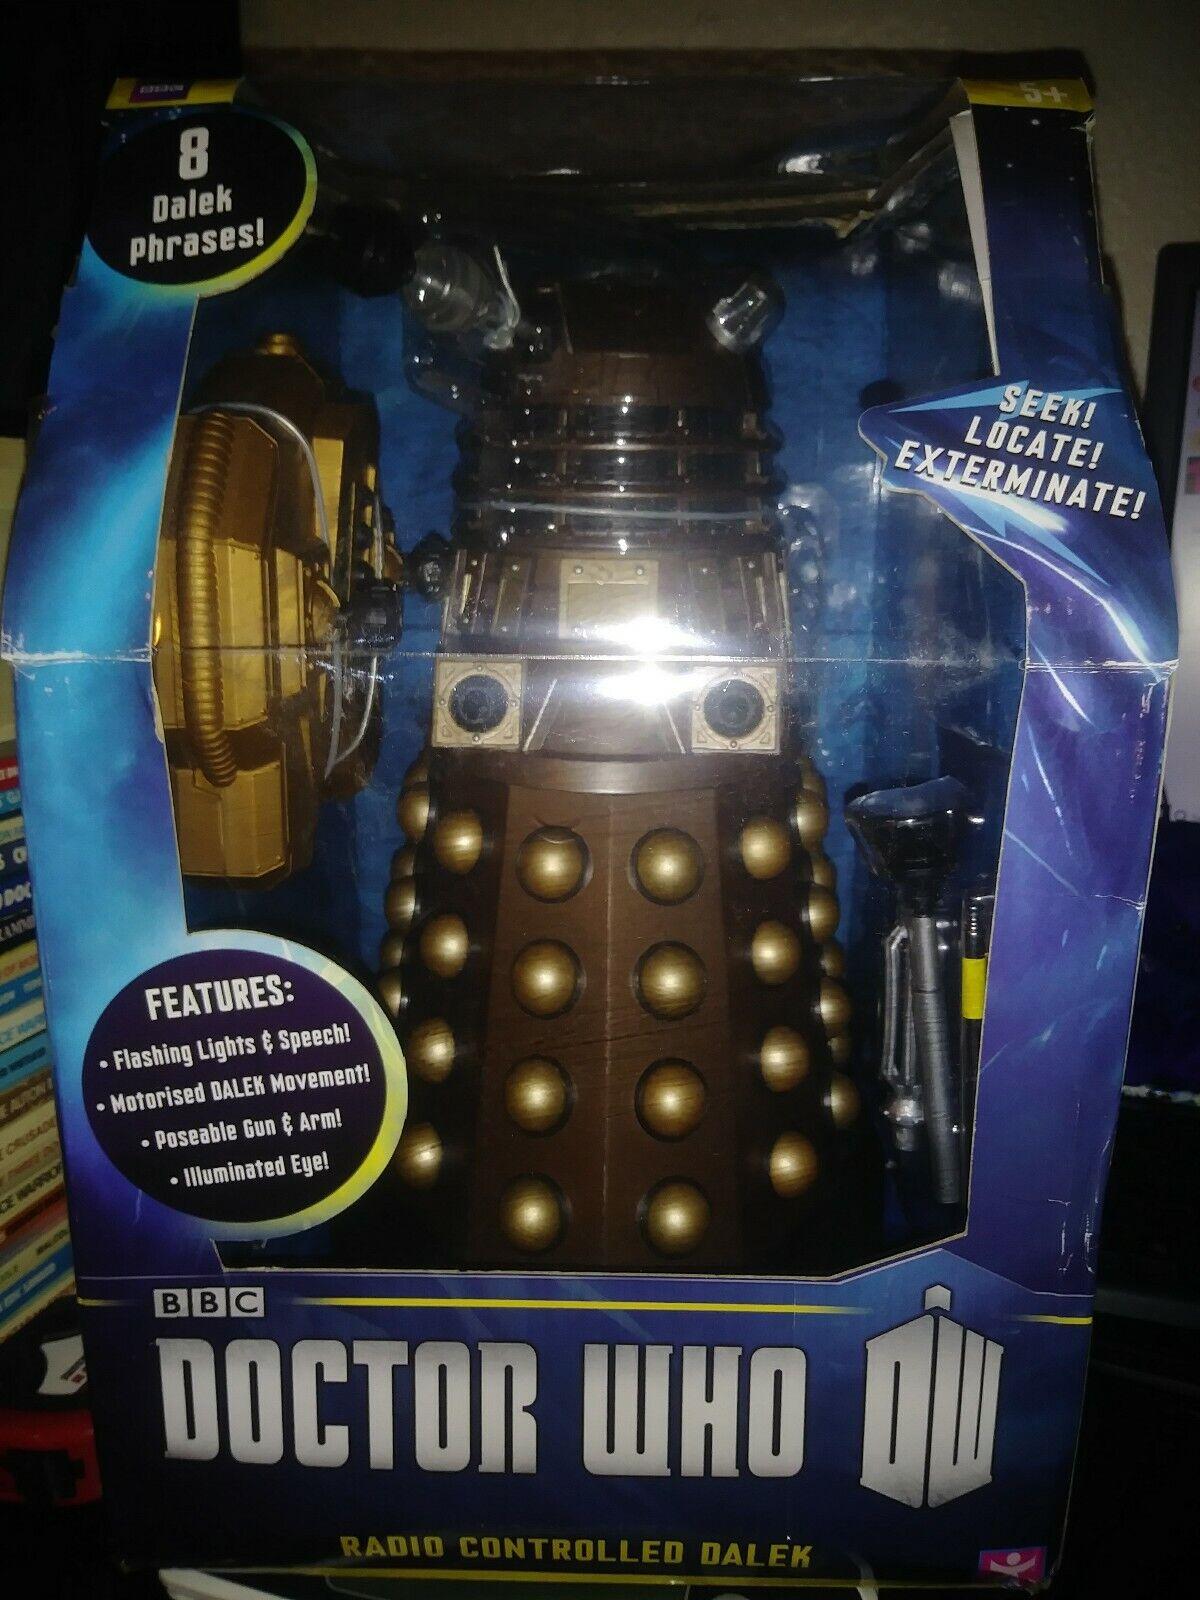 Keyring Doctor Who Baker - Needs You